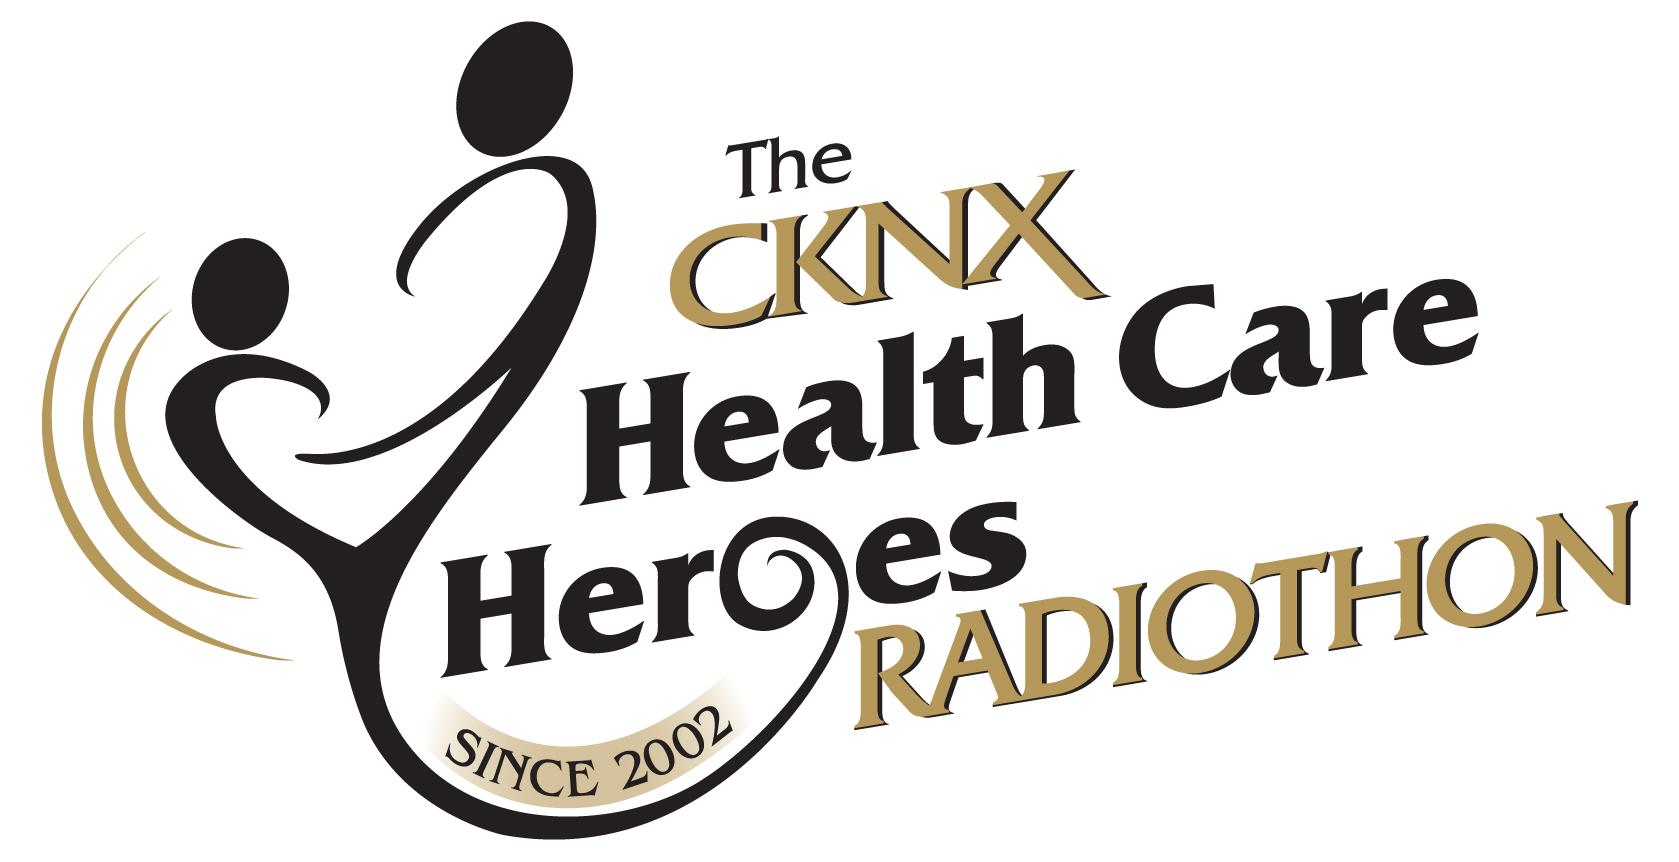 The CKNX Health Care Heroes Radiothon Logo